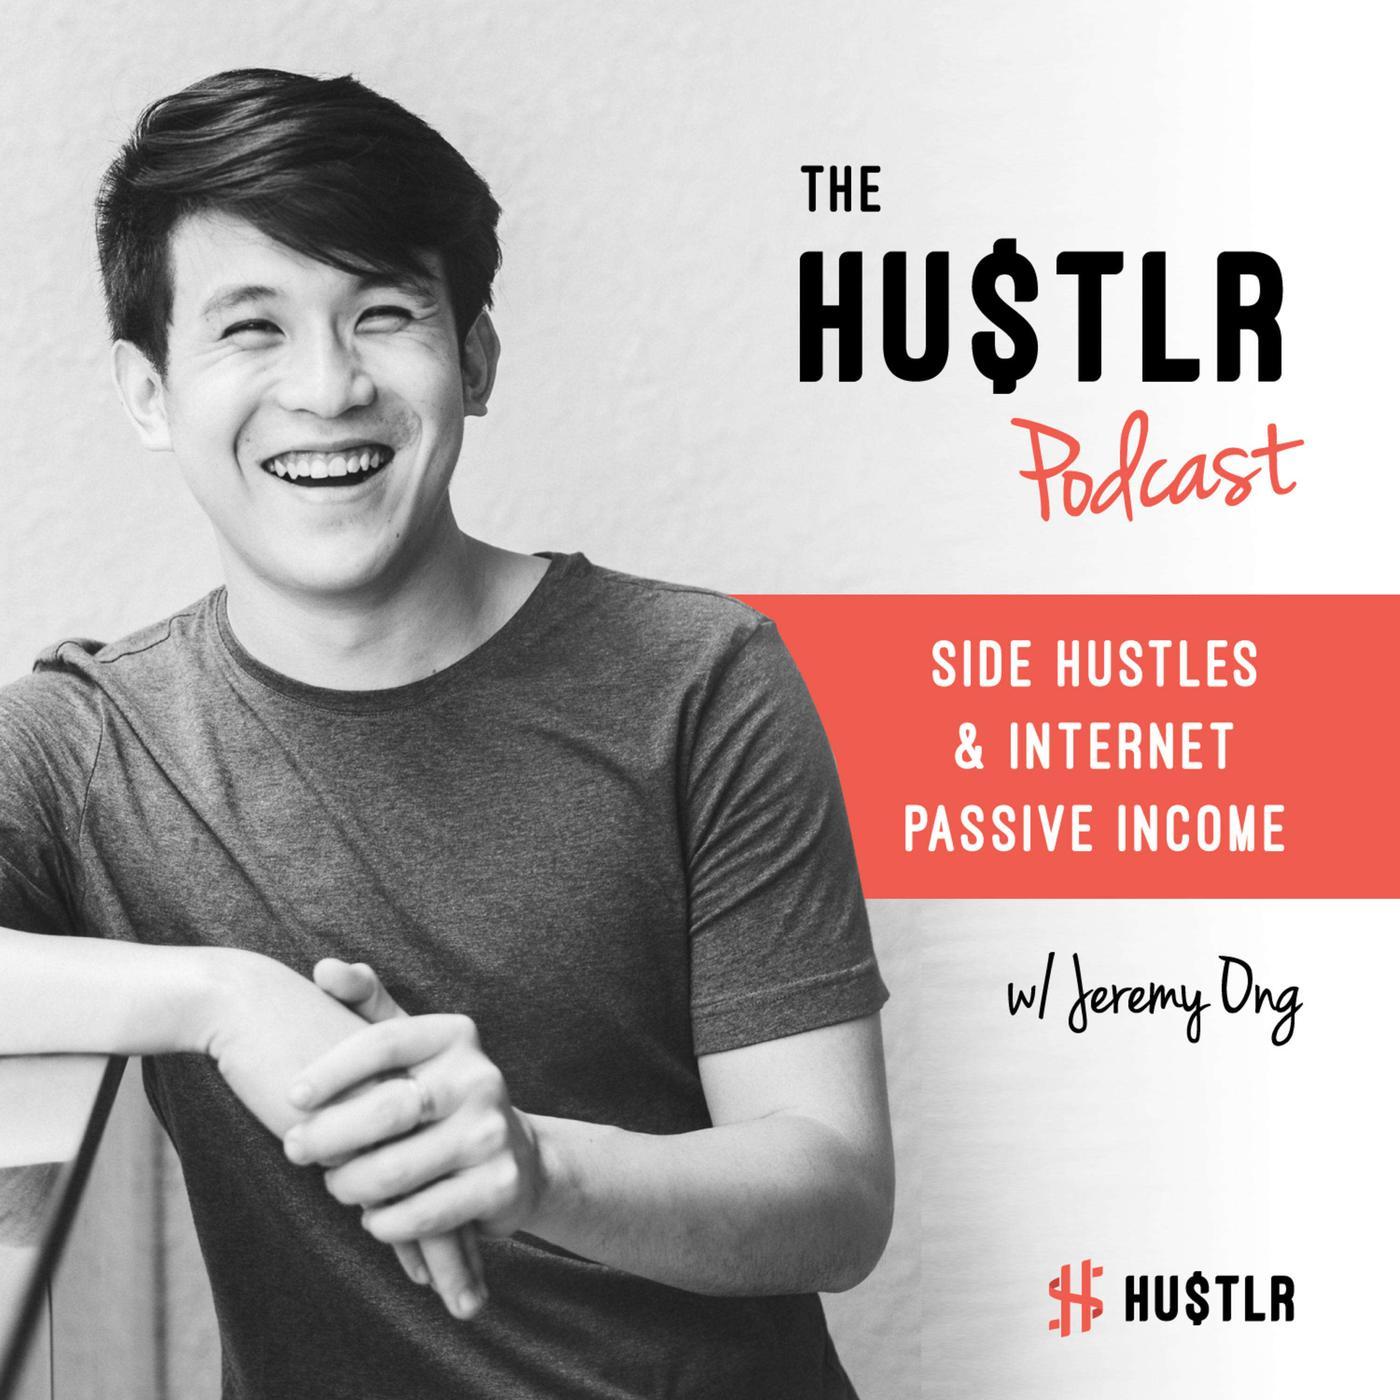 the-hustlr-podcast-1400x1400